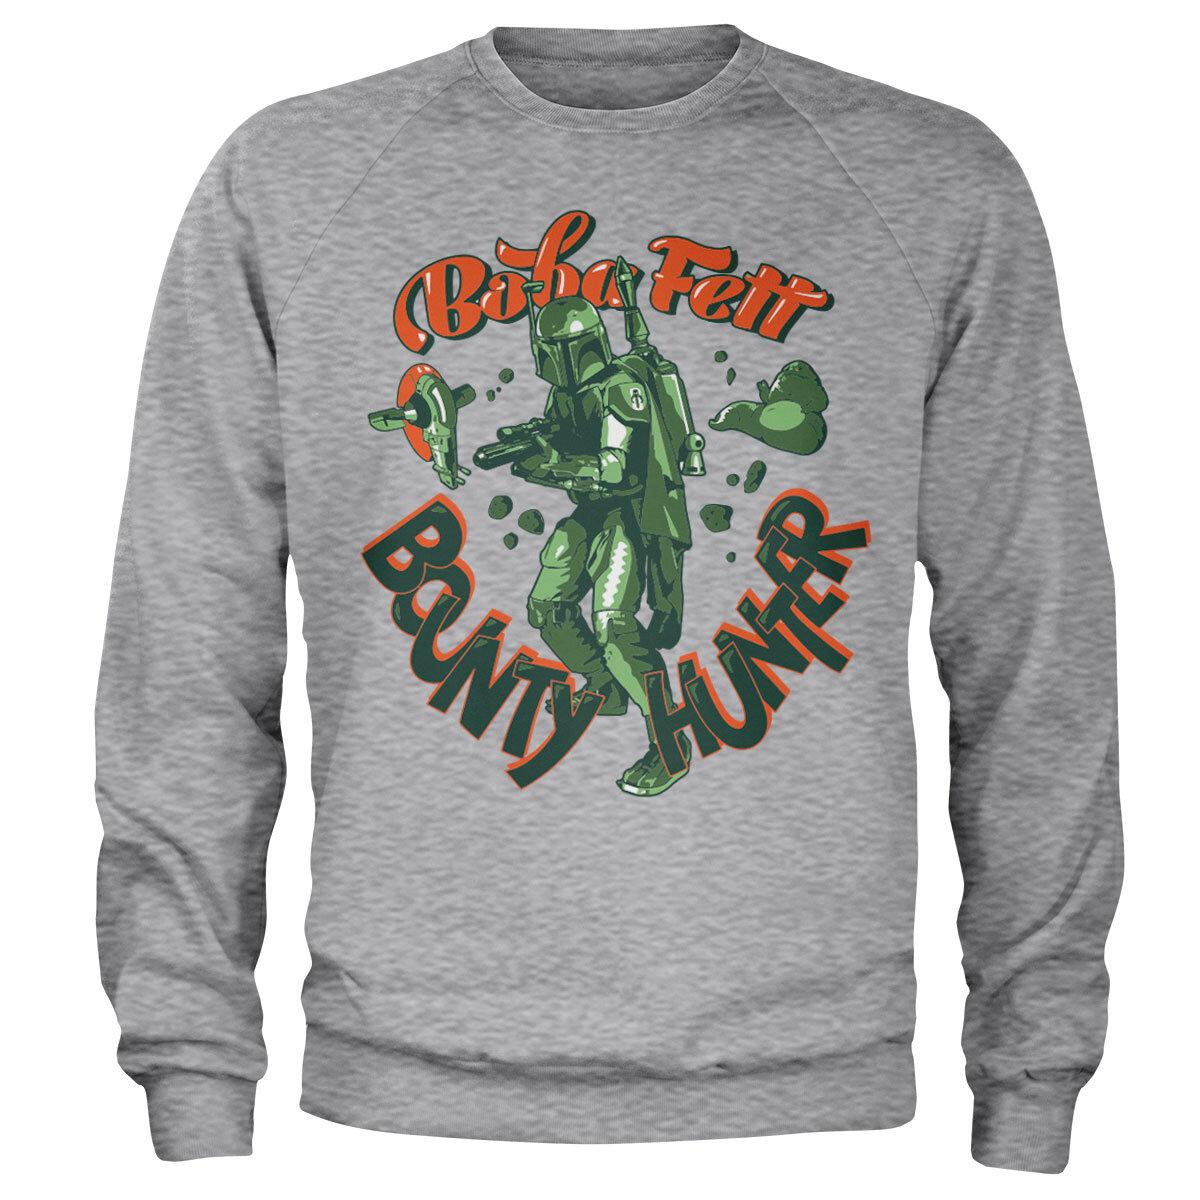 Star Wars - Boba Fett Sweatshirt